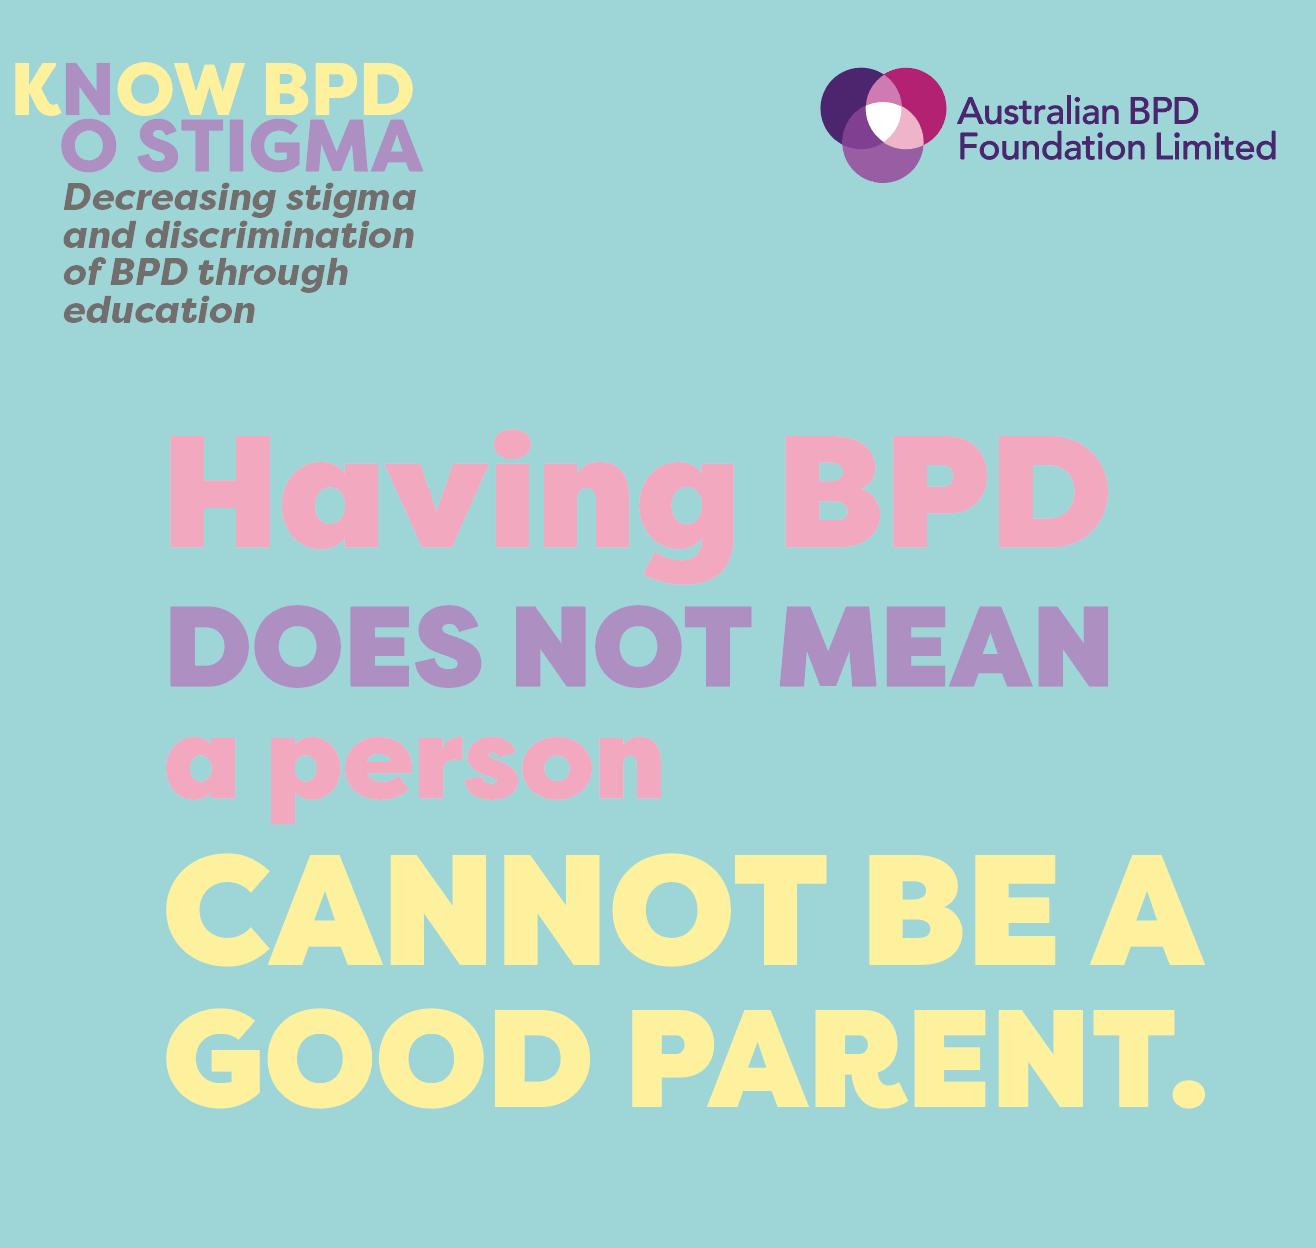 BPD Parent